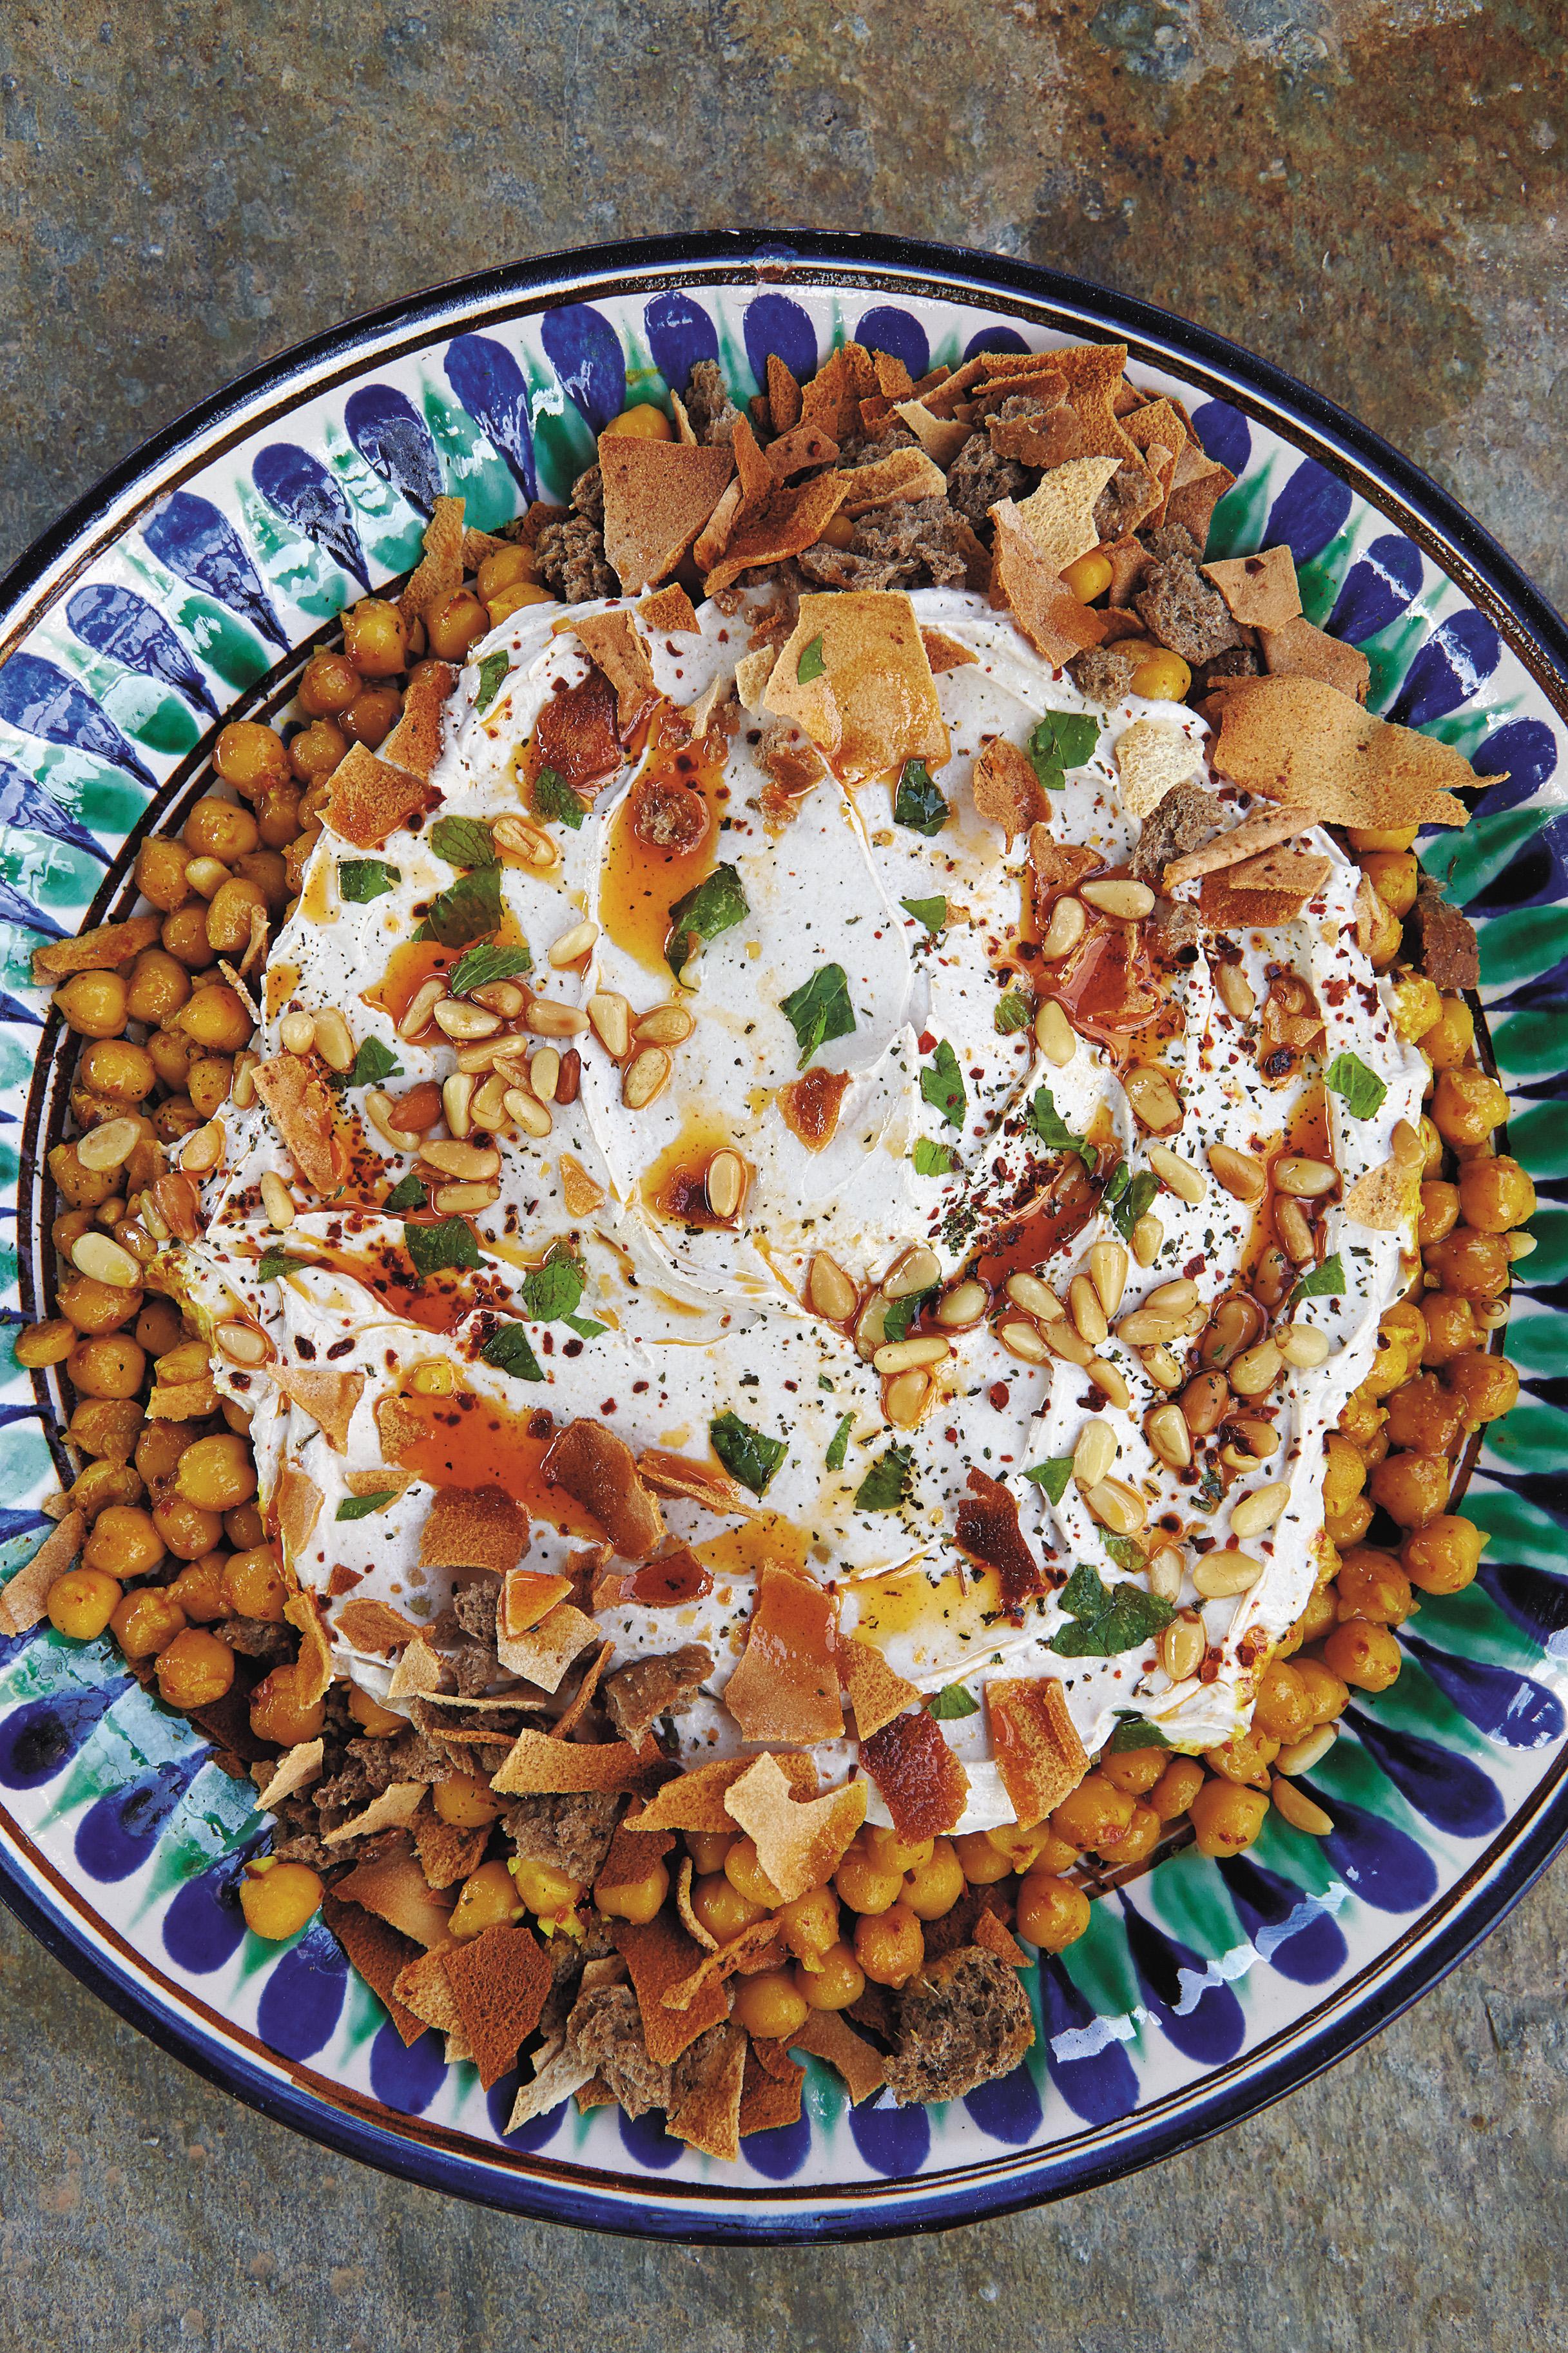 Aglaia's Chickpeas and Toasted Bread with Yogurt-Tahini Sauce (Fattet Hummus)